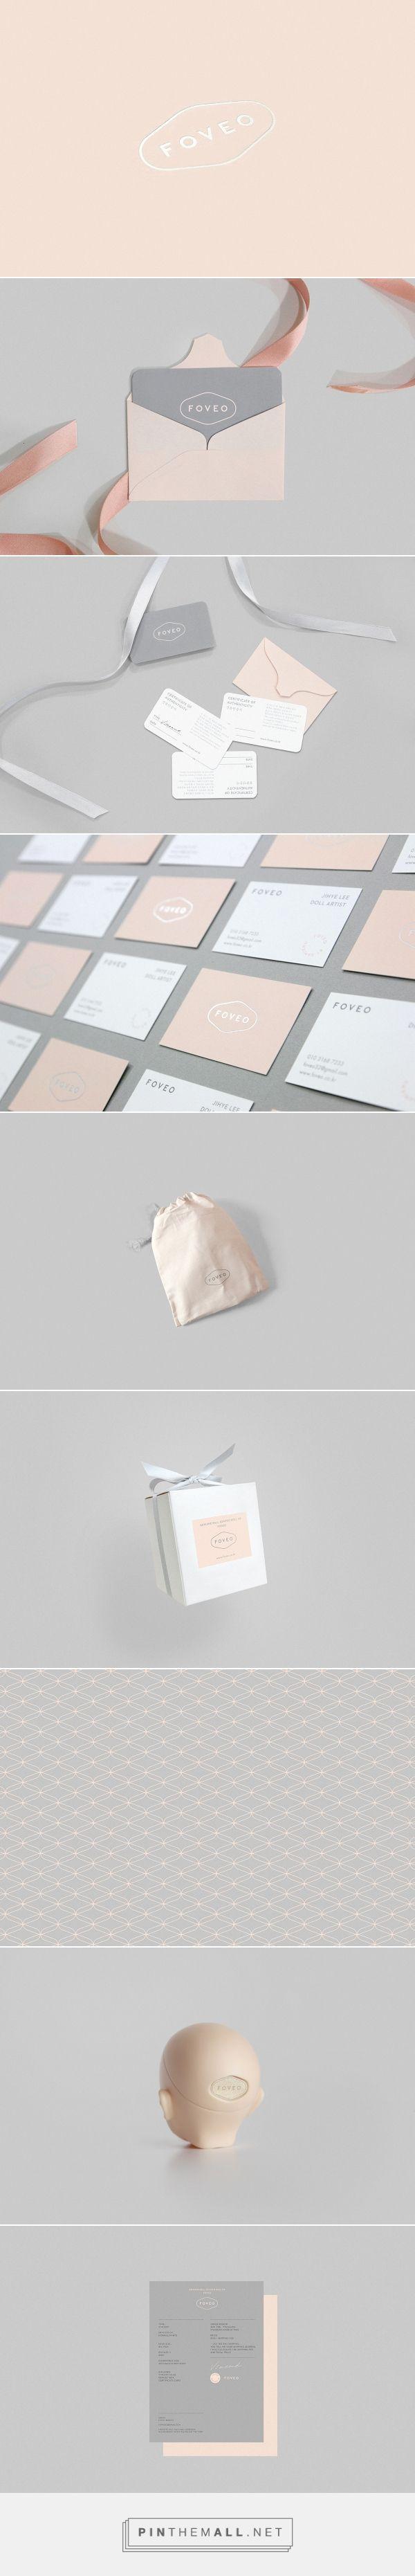 Foveo Branding by Triangle Studio on Behance